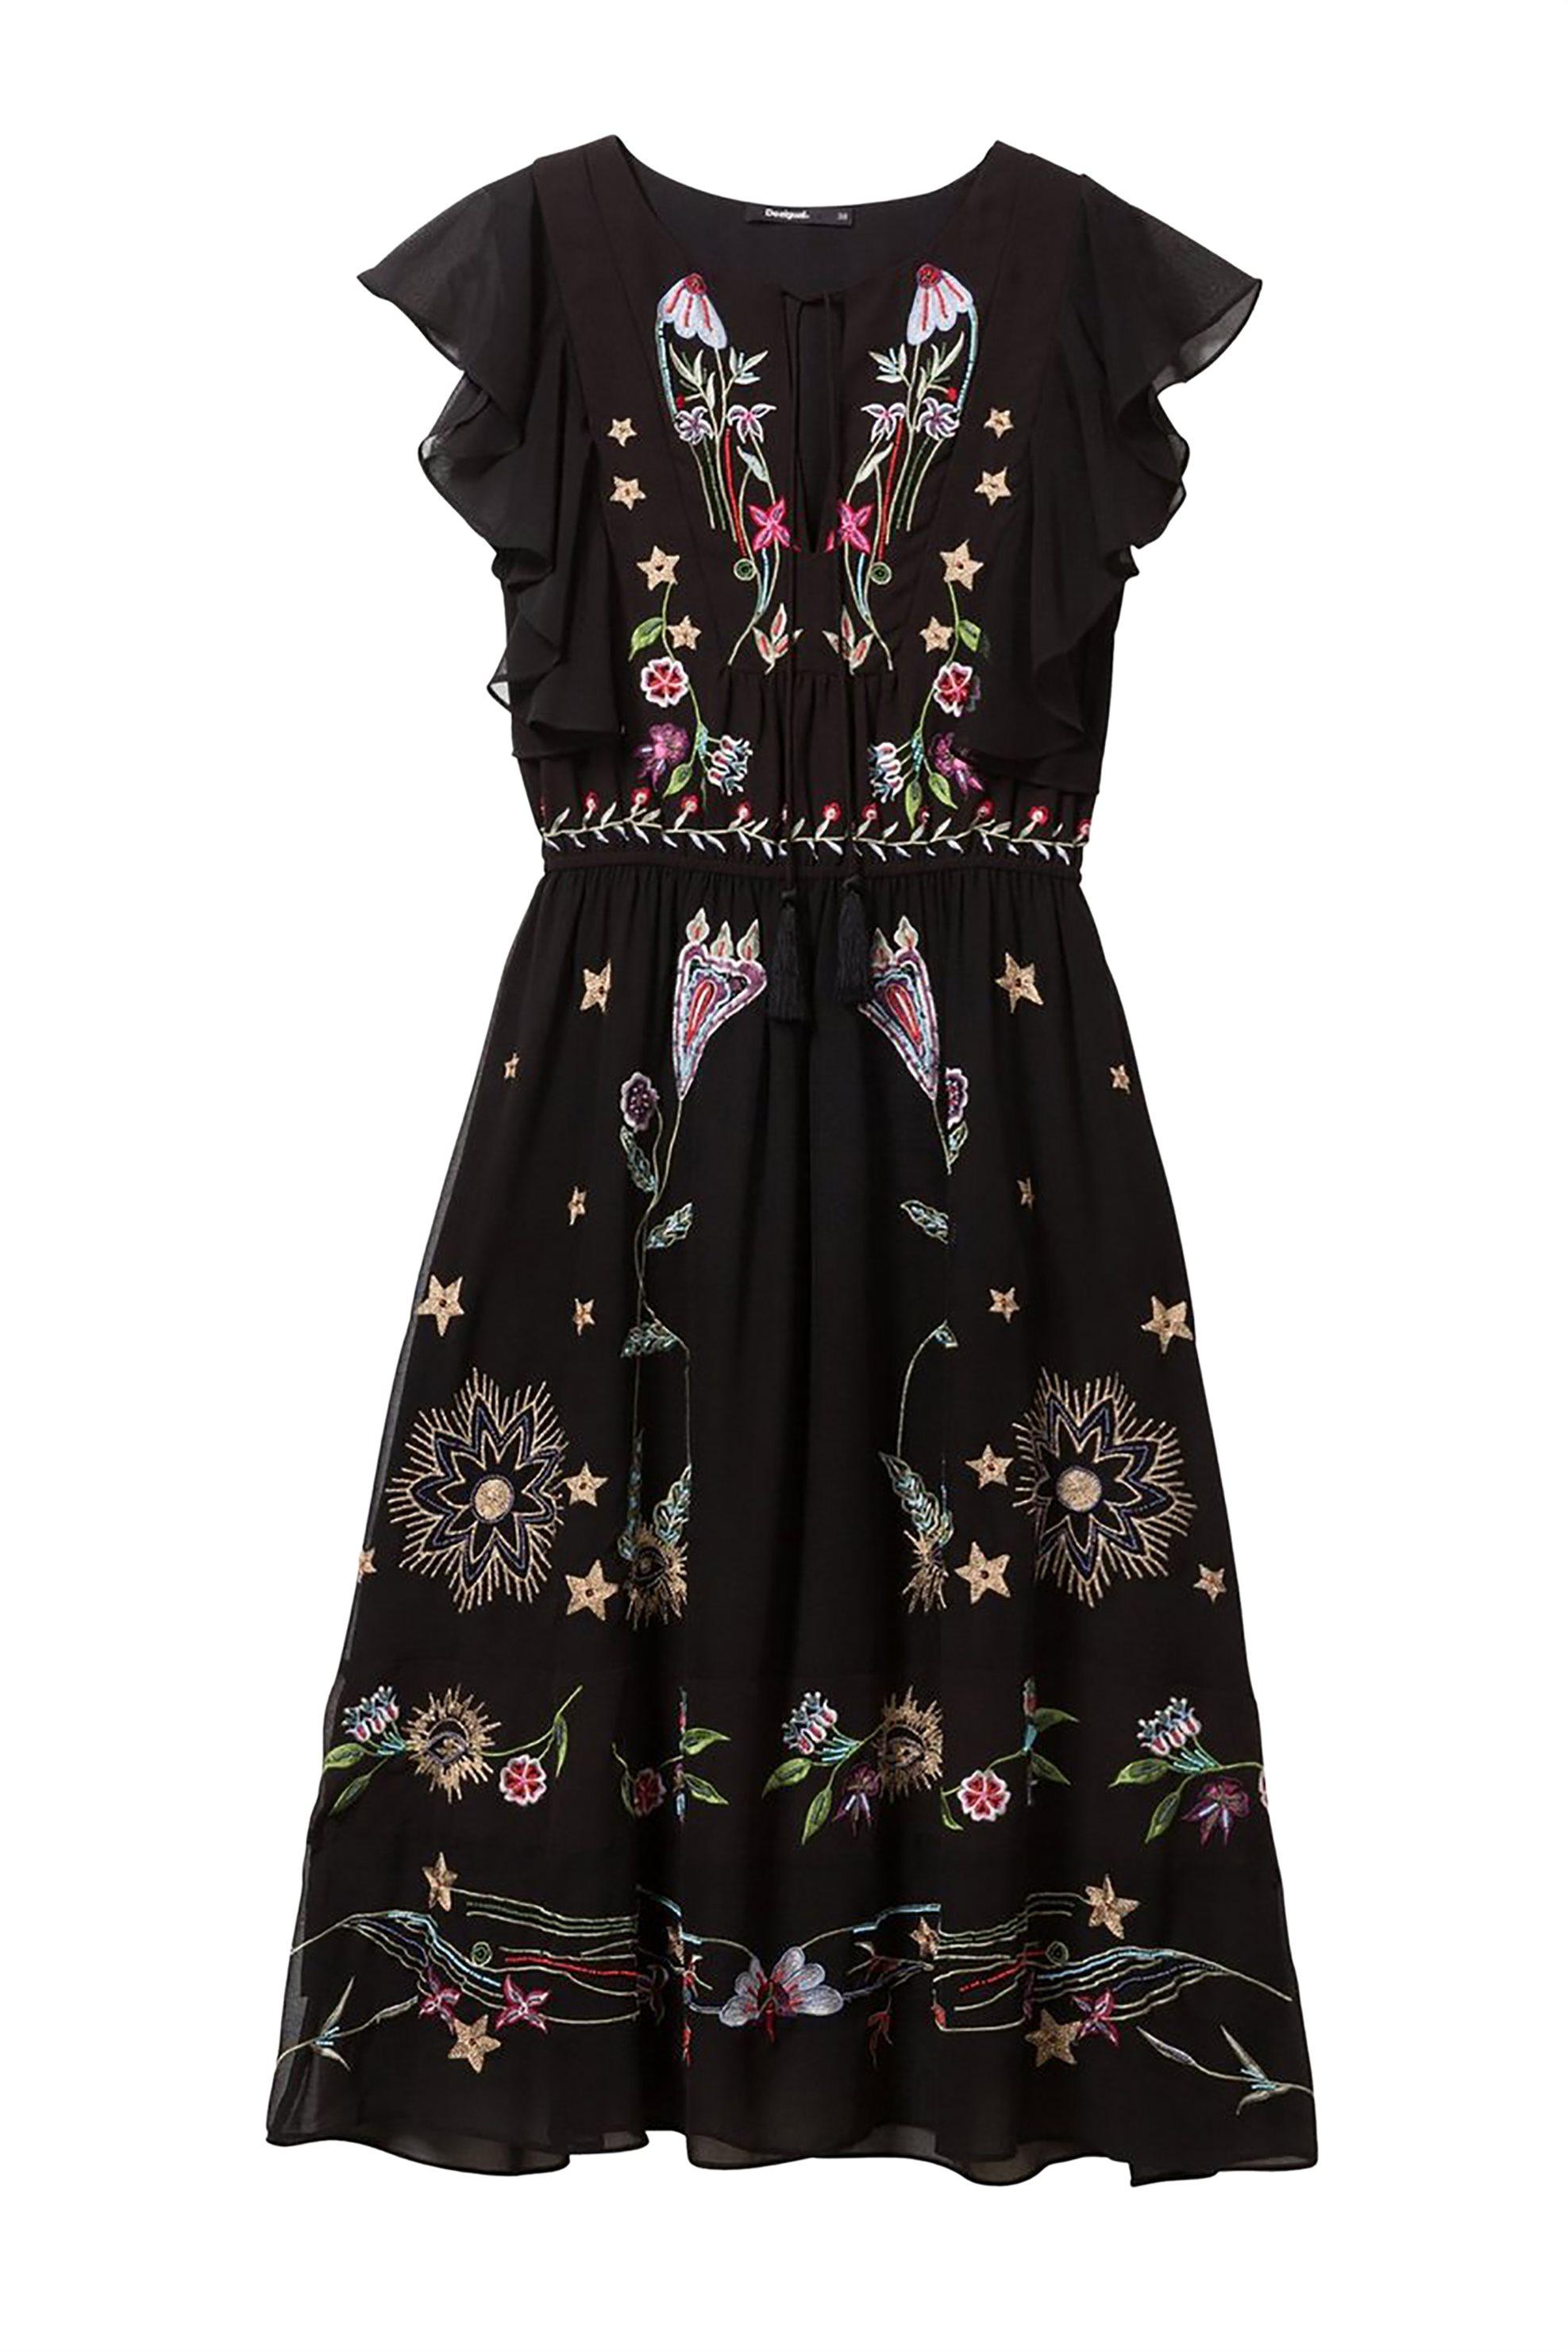 18179df0503e Notos Desigual γυναικείo φόρεμα με κεντήματα Sandy - 19SWVW70 - Μαύρο